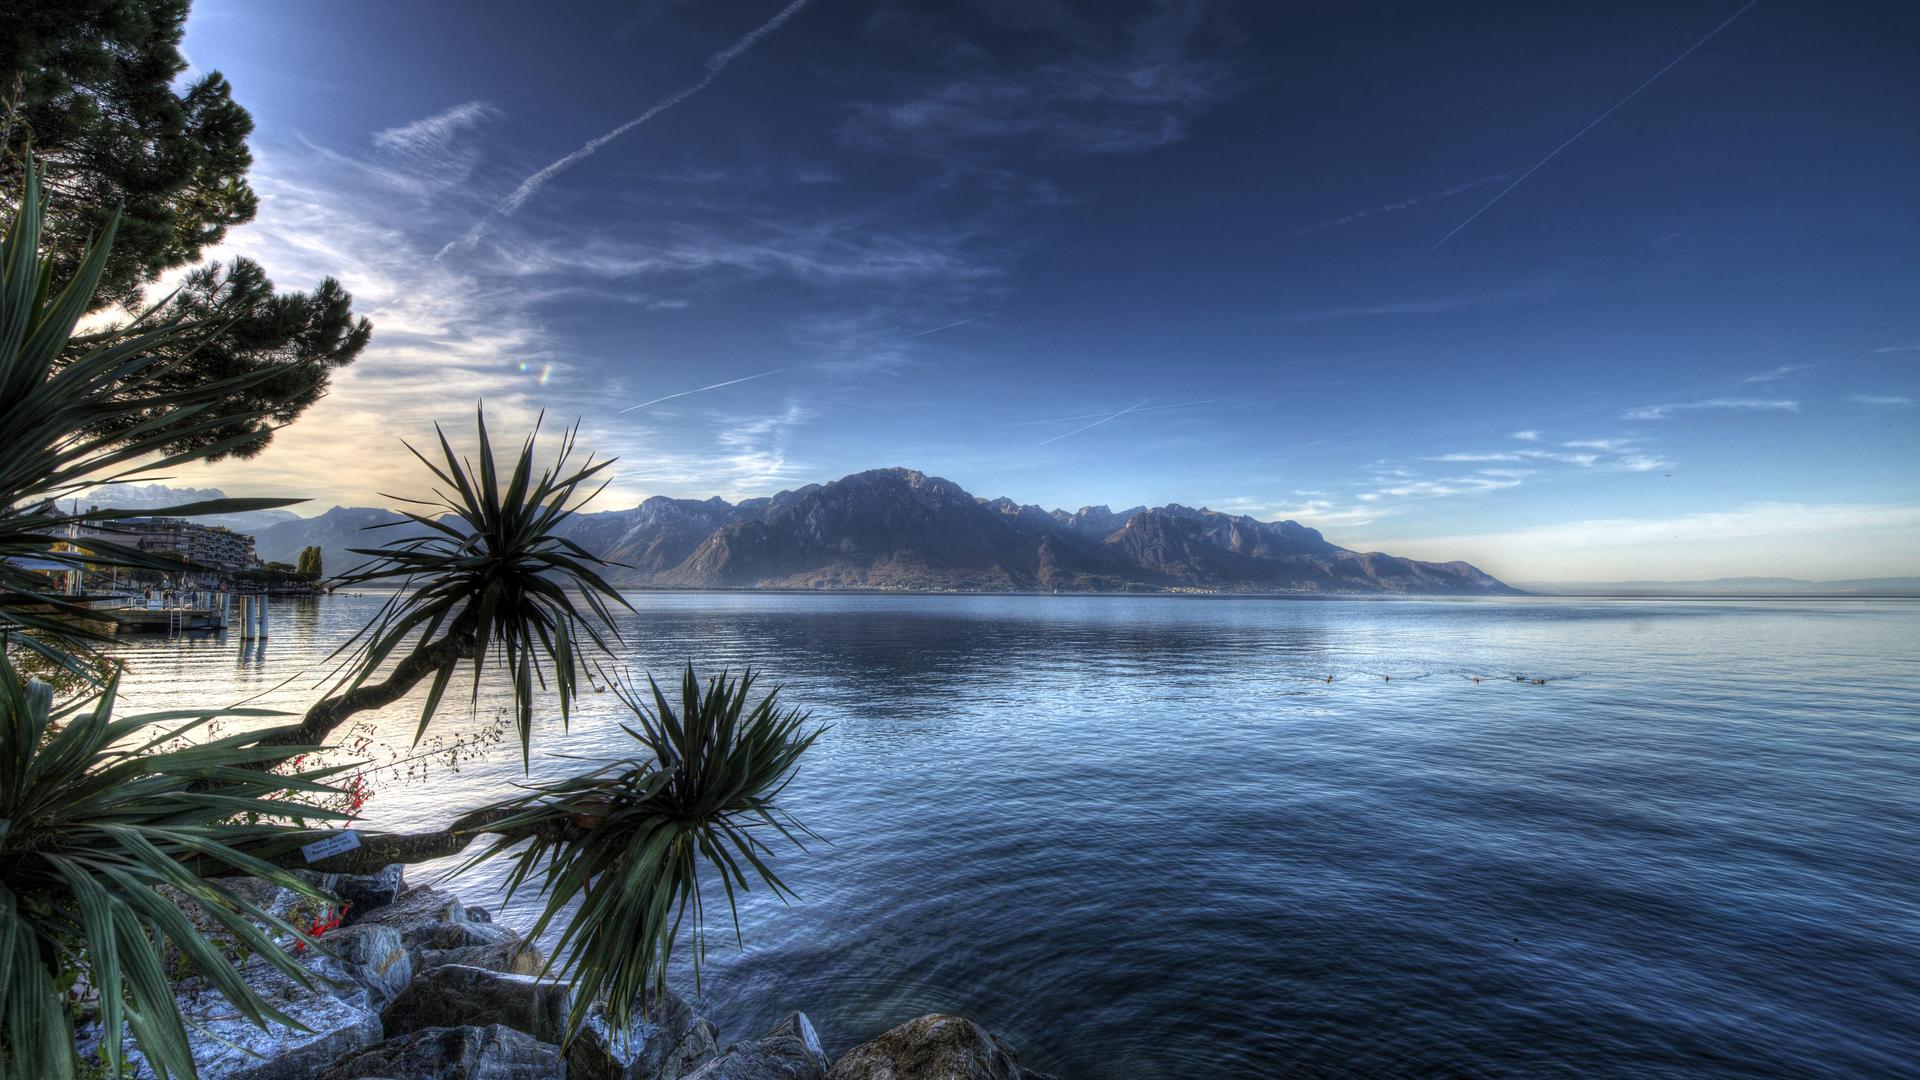 1920x1080 Montreux Lake Switzerland 4k Laptop Full HD ...